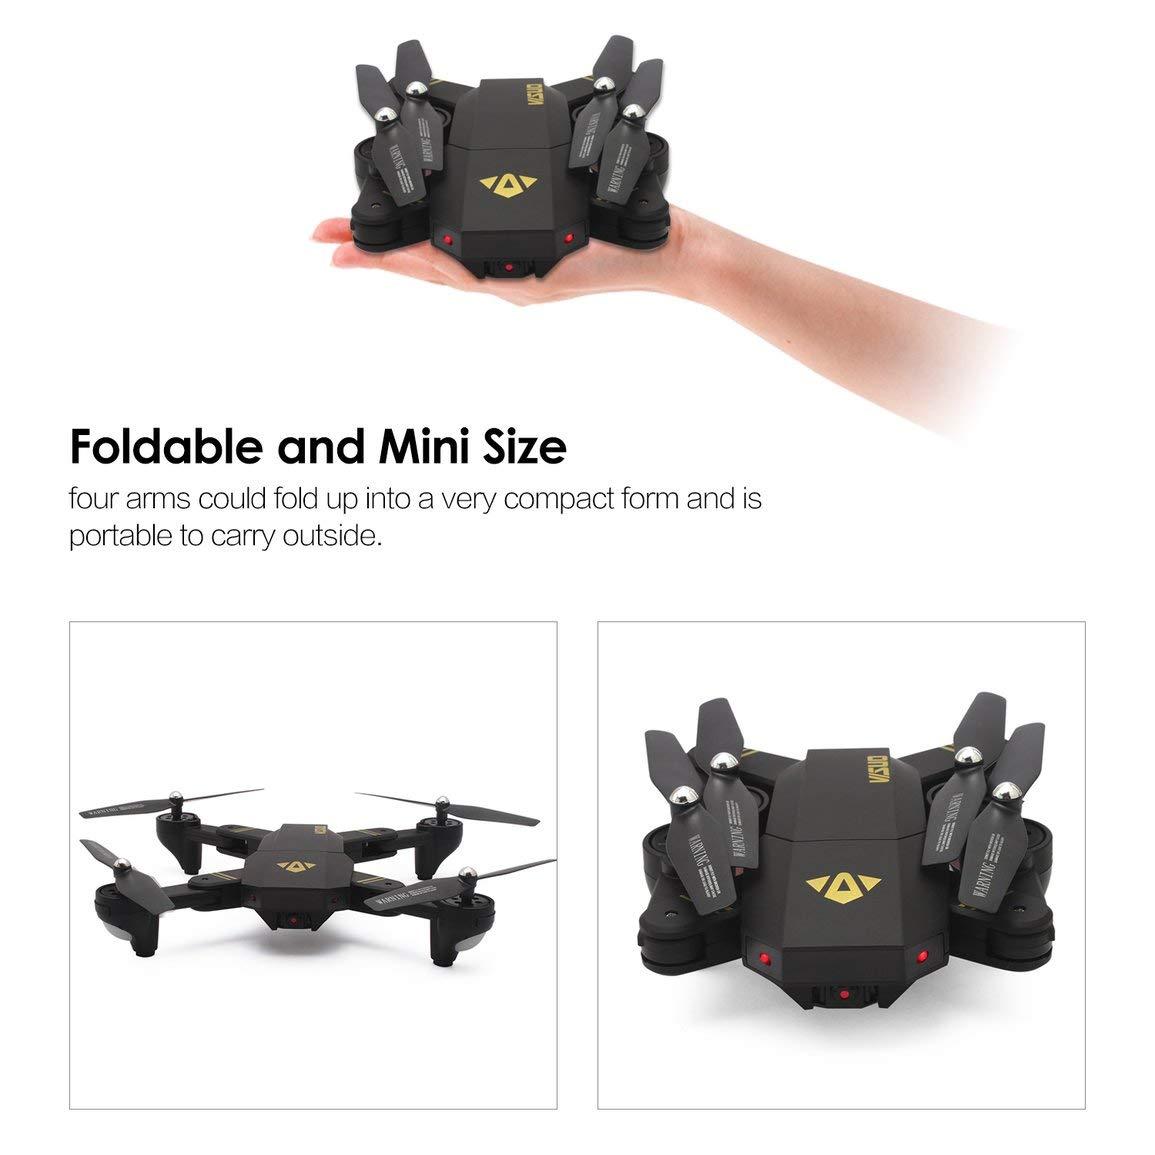 VISUO XS809HW 2.4G cámara Plegable WiFi FPV Selfie RC Drone ...